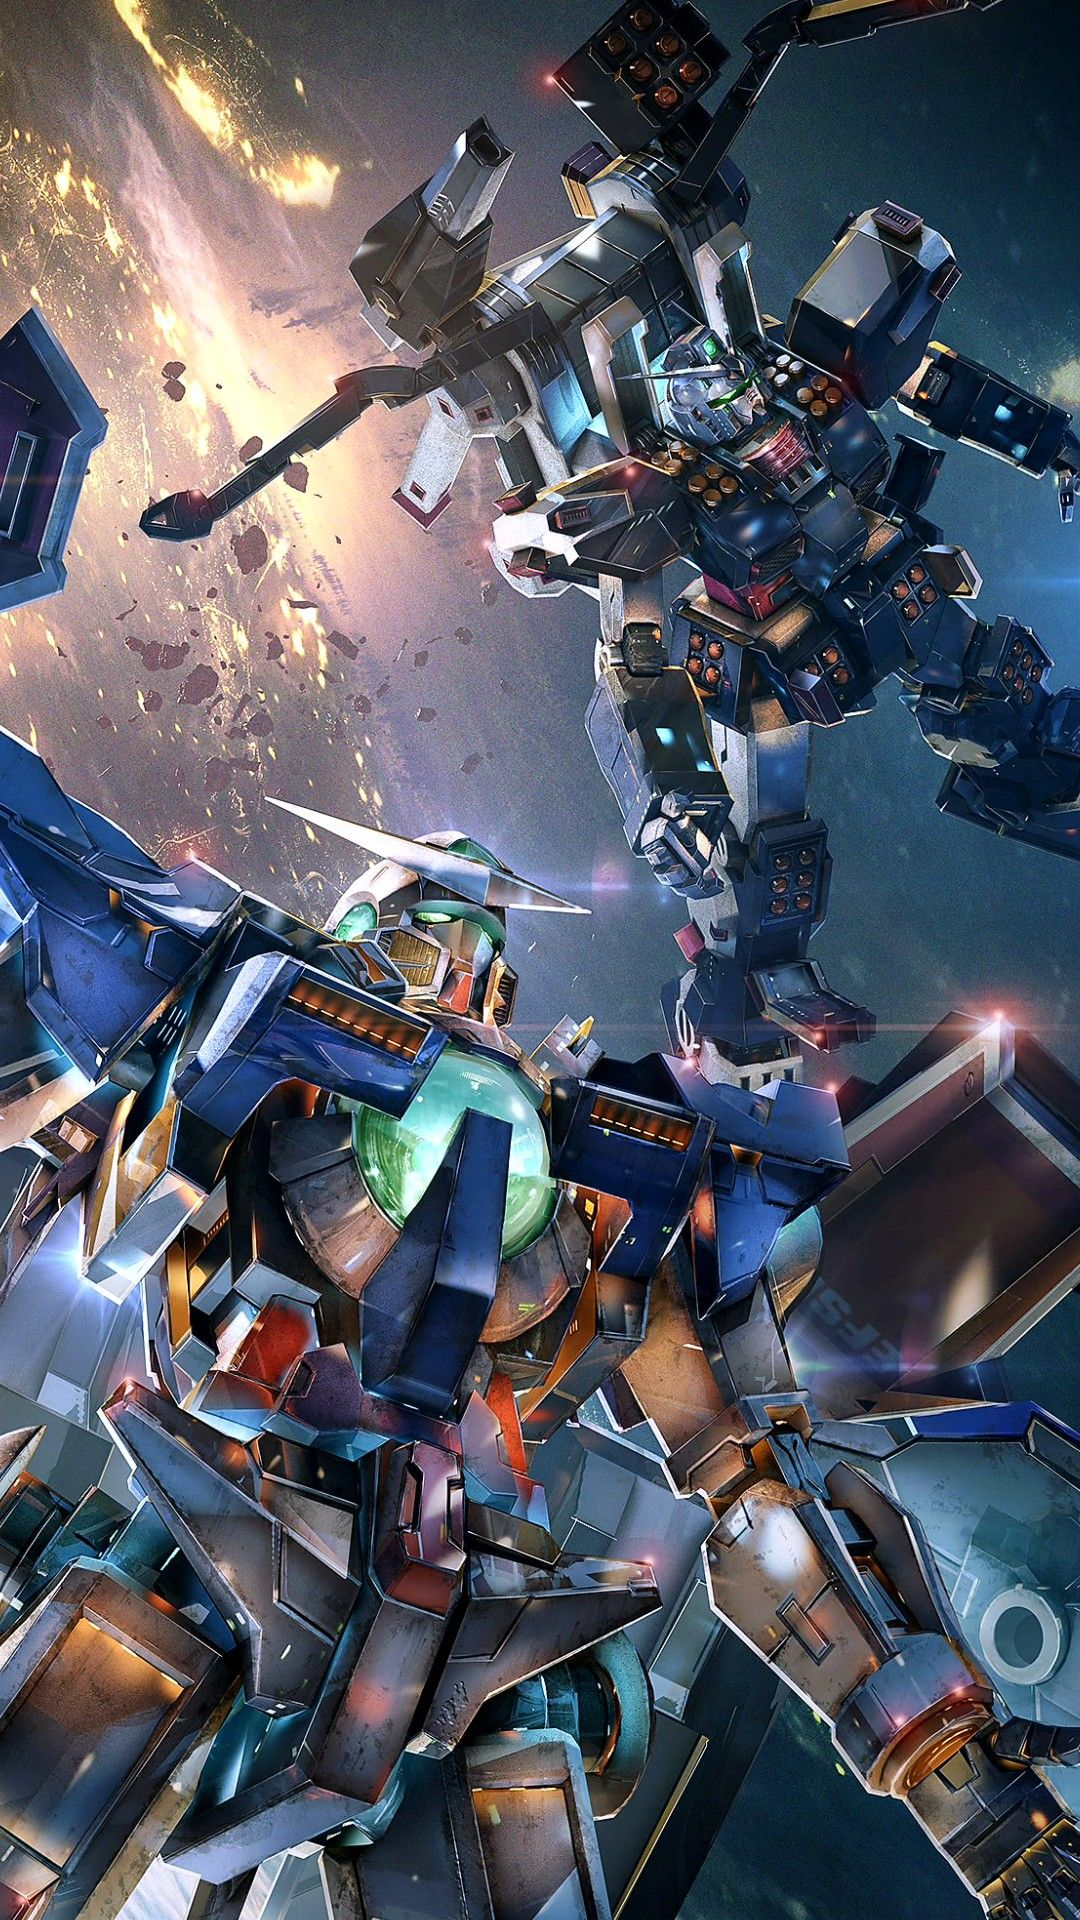 Mesigaqueeusigovoce Gundam Wallpapers Gundam Art Anime Wallpaper Gundam exia wallpaper 4k